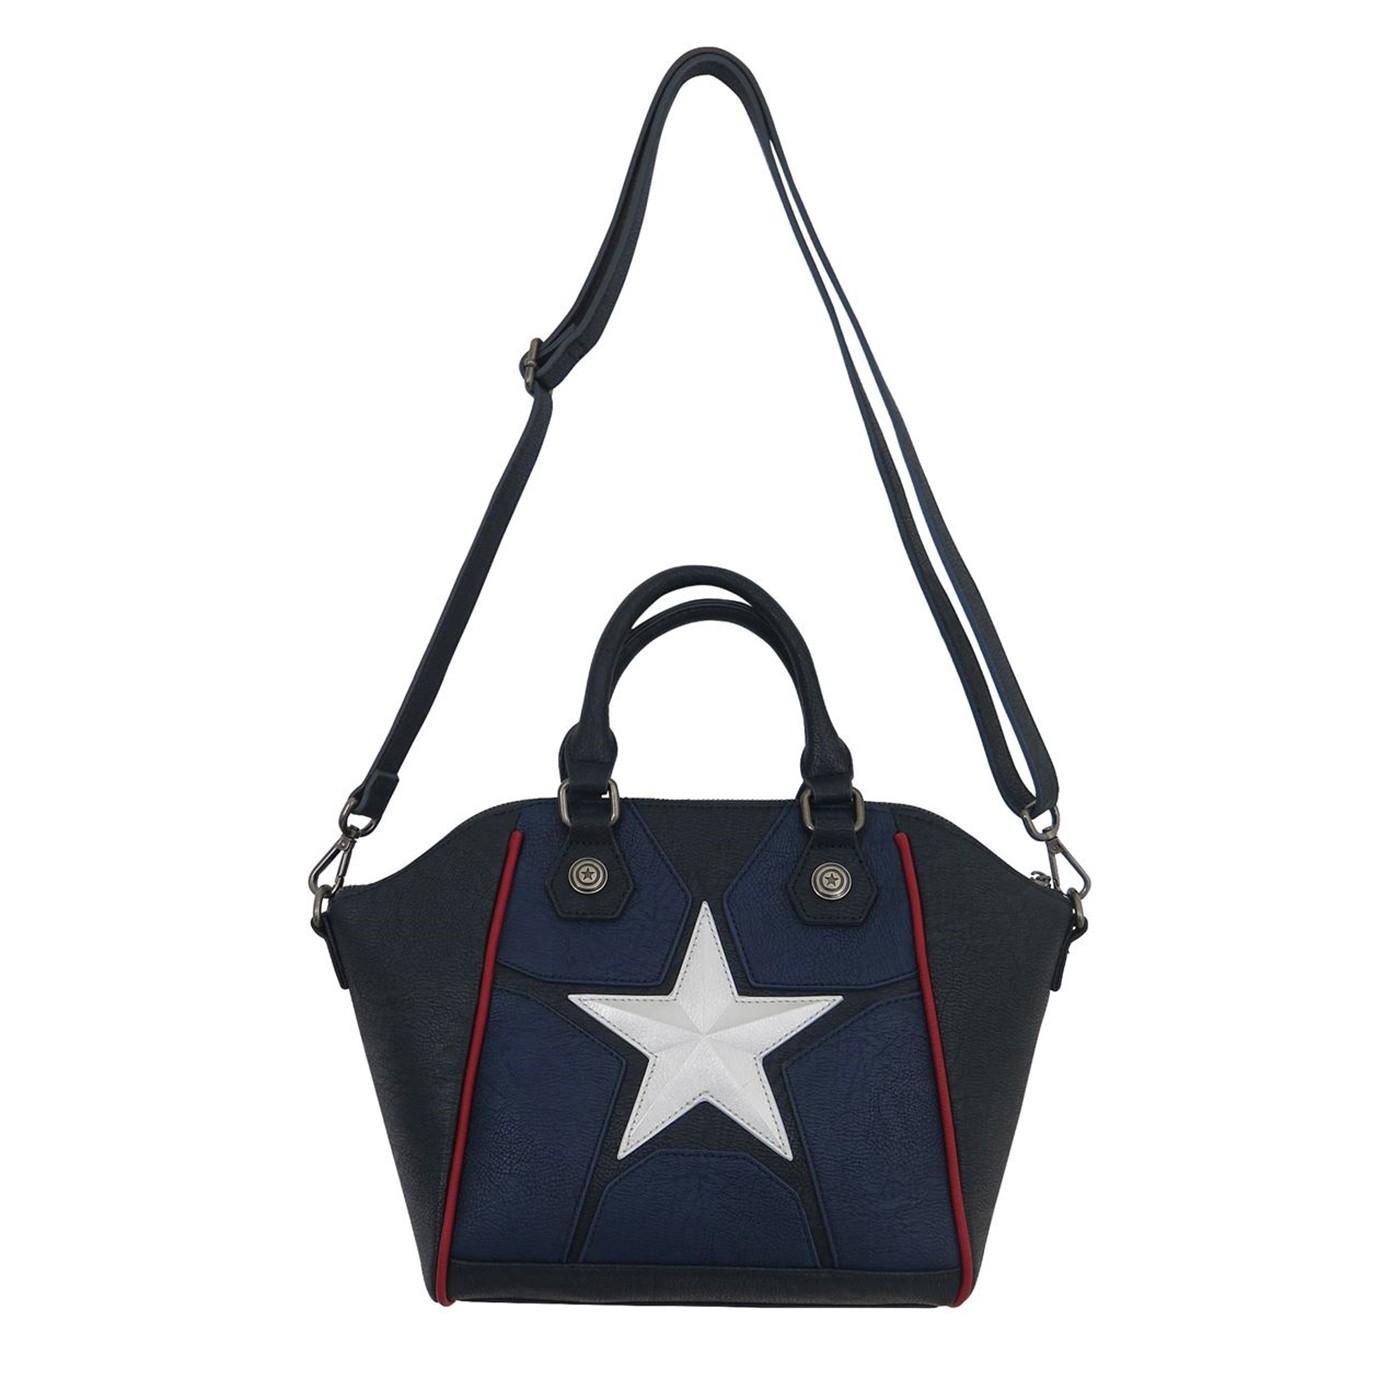 Captain America Star Logo Loungefly Crossbody Handbag